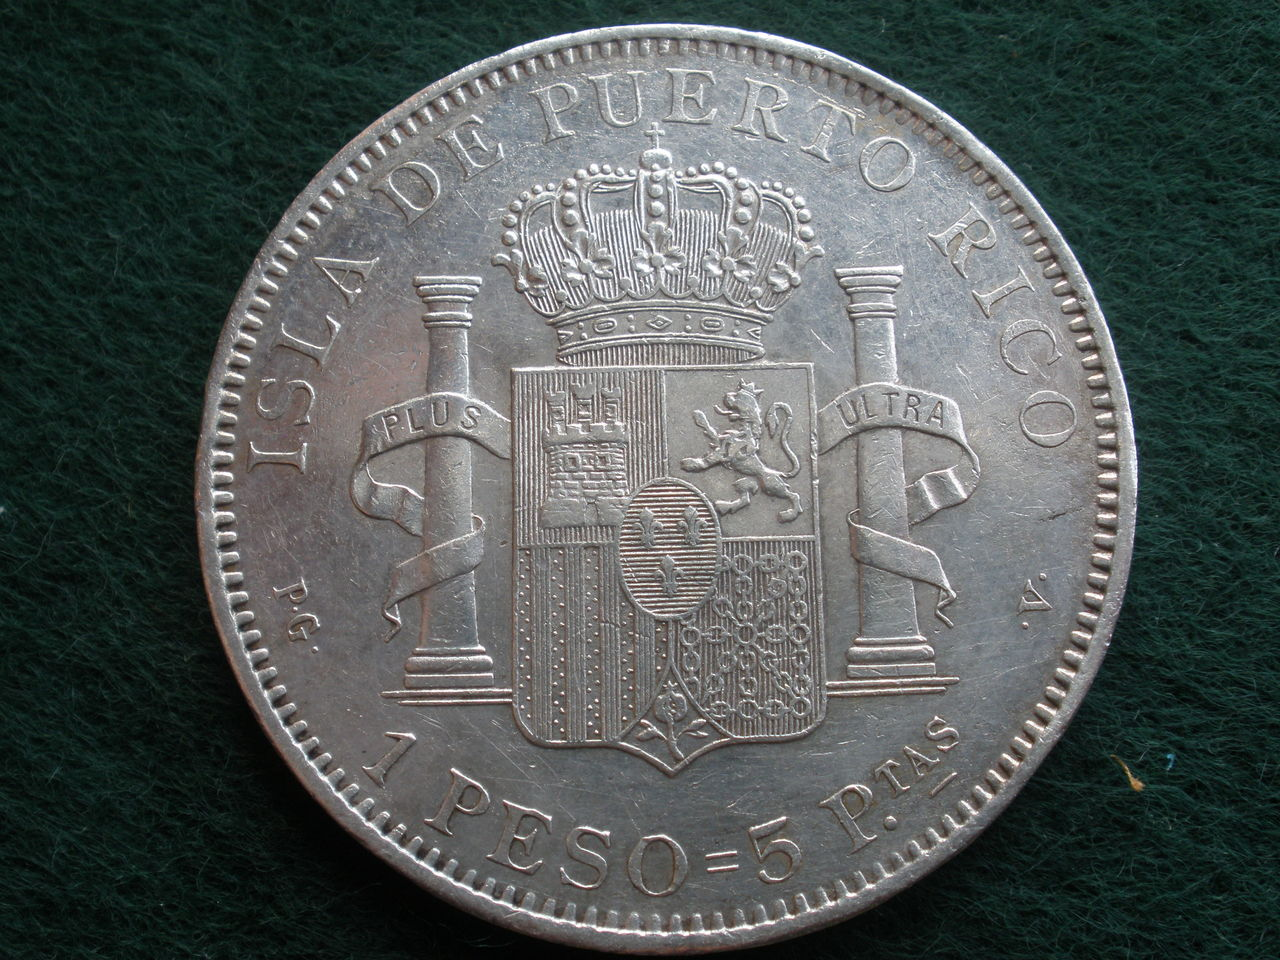 1895. Alfonso XIII 1 peso Puerto Rico P1010200